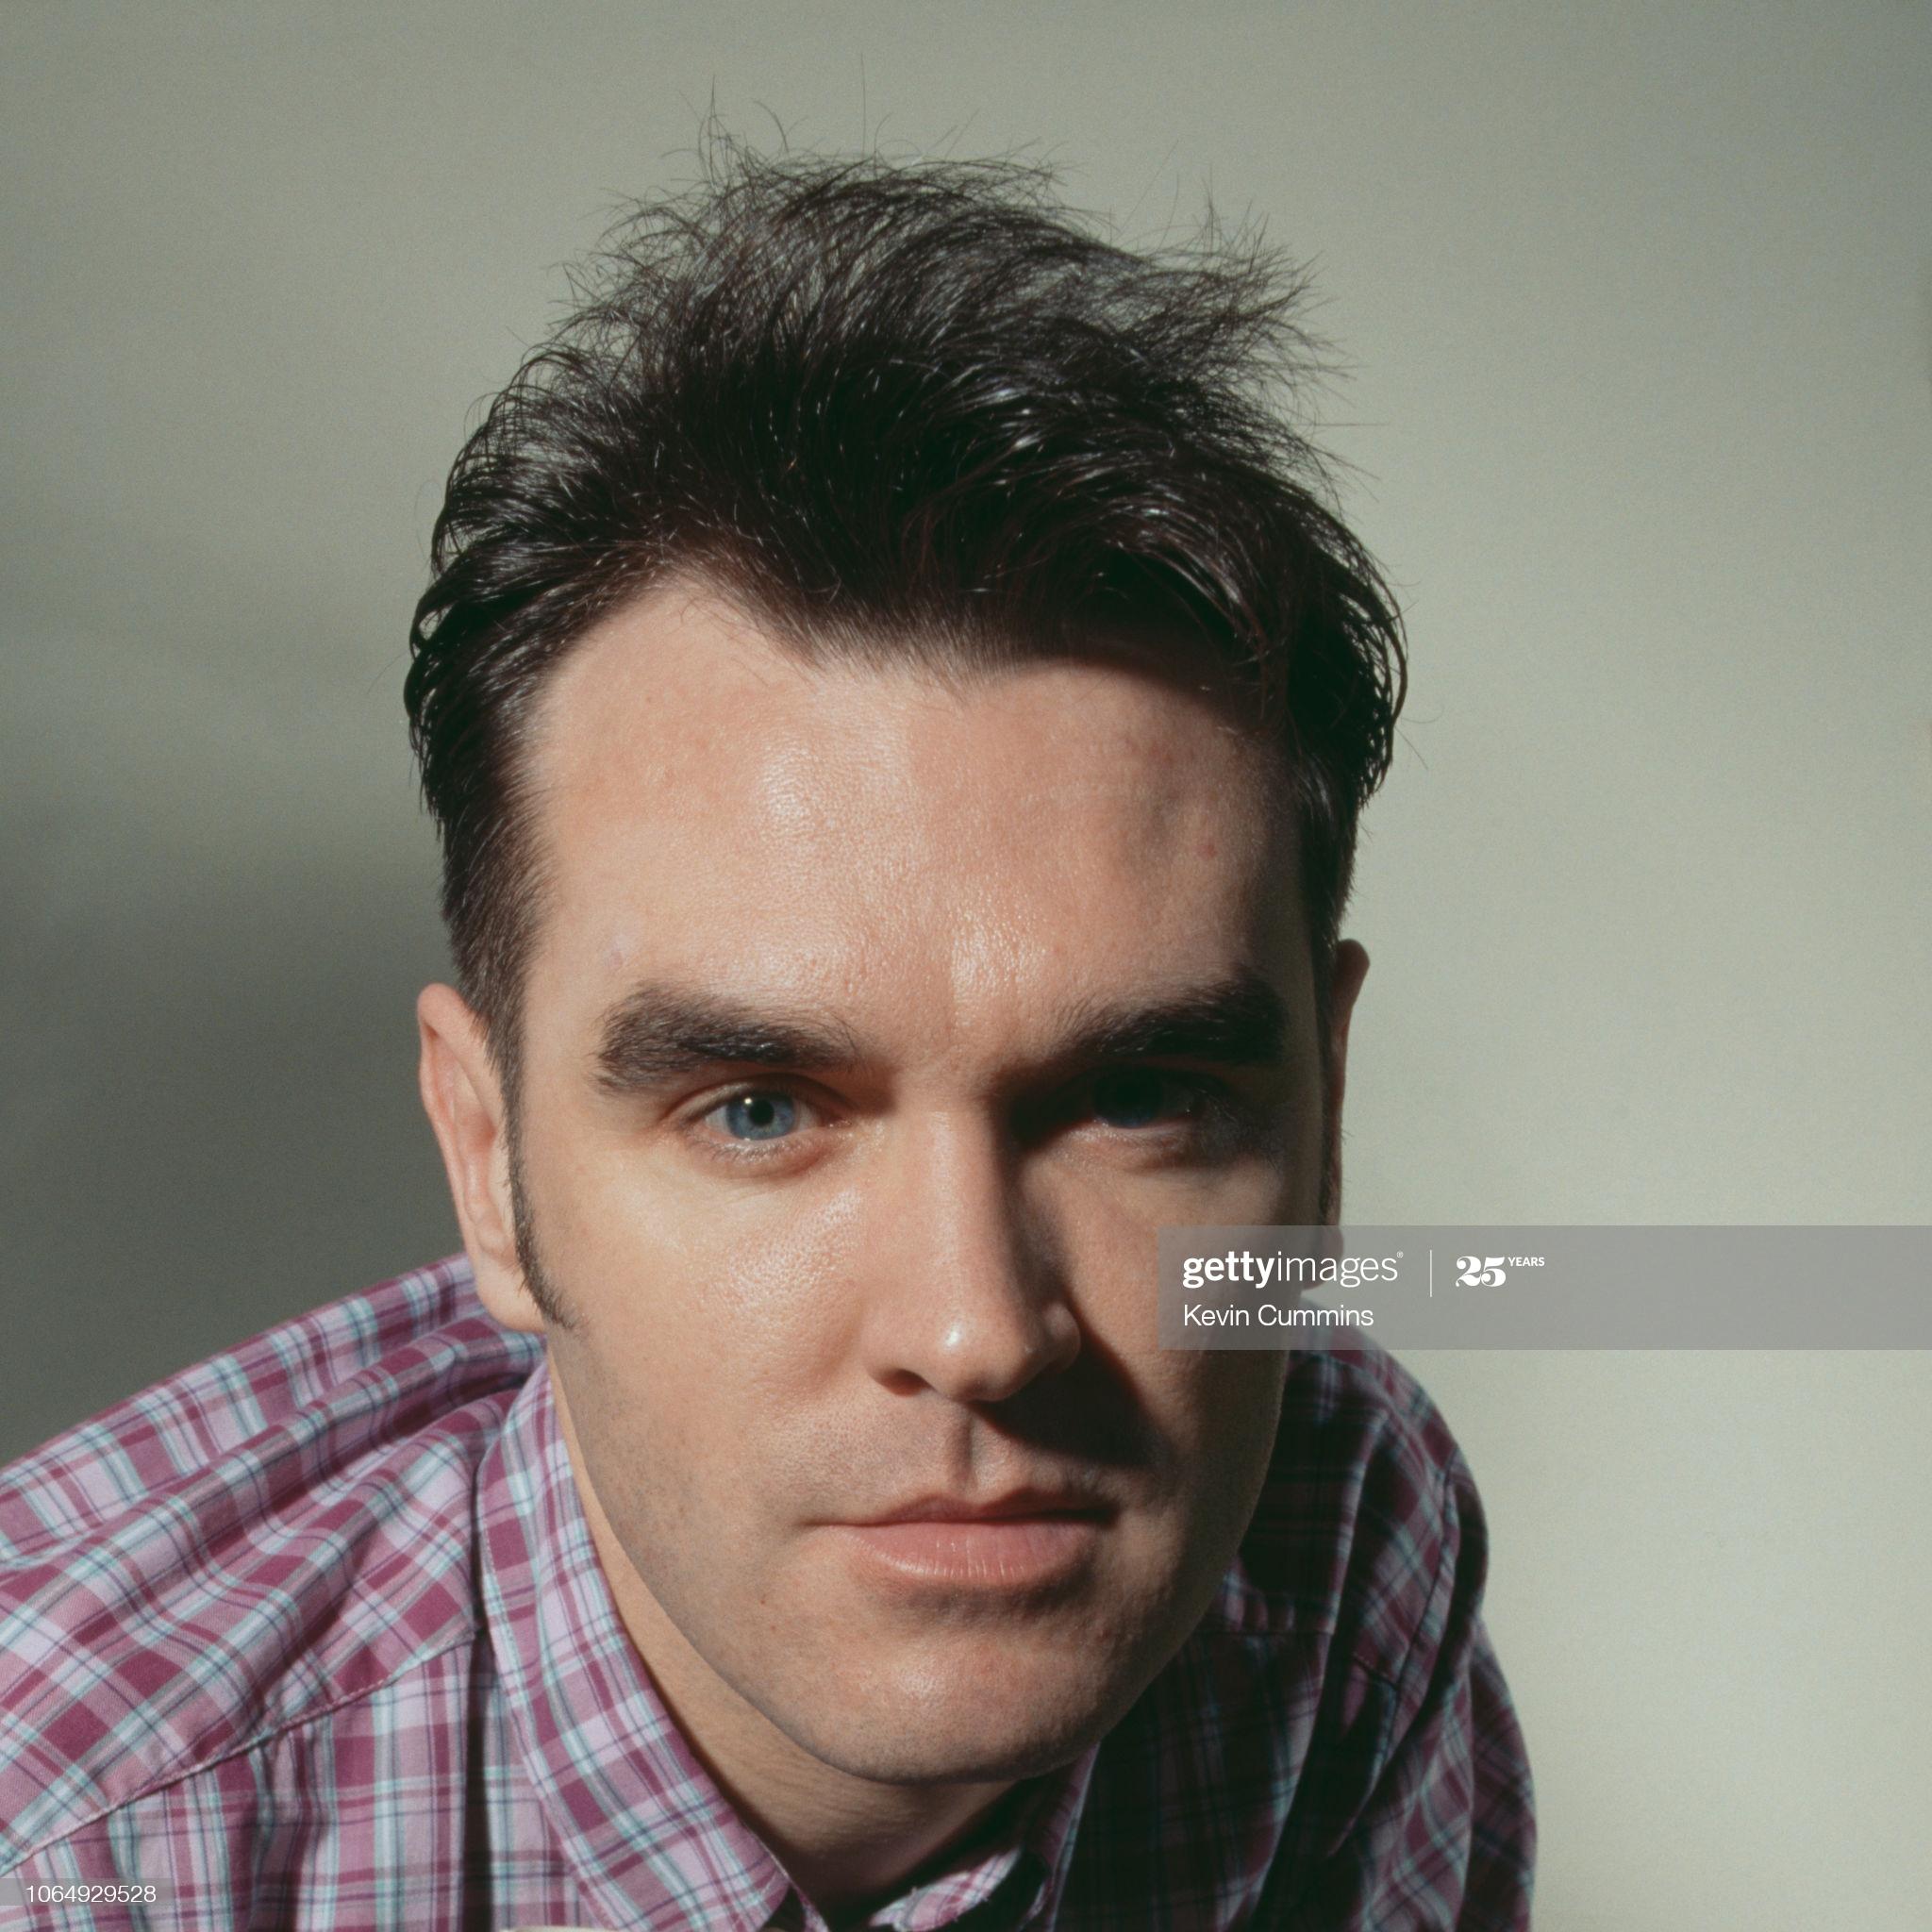 Morrissey 24th March 1992 Kevin Cummins.jpg